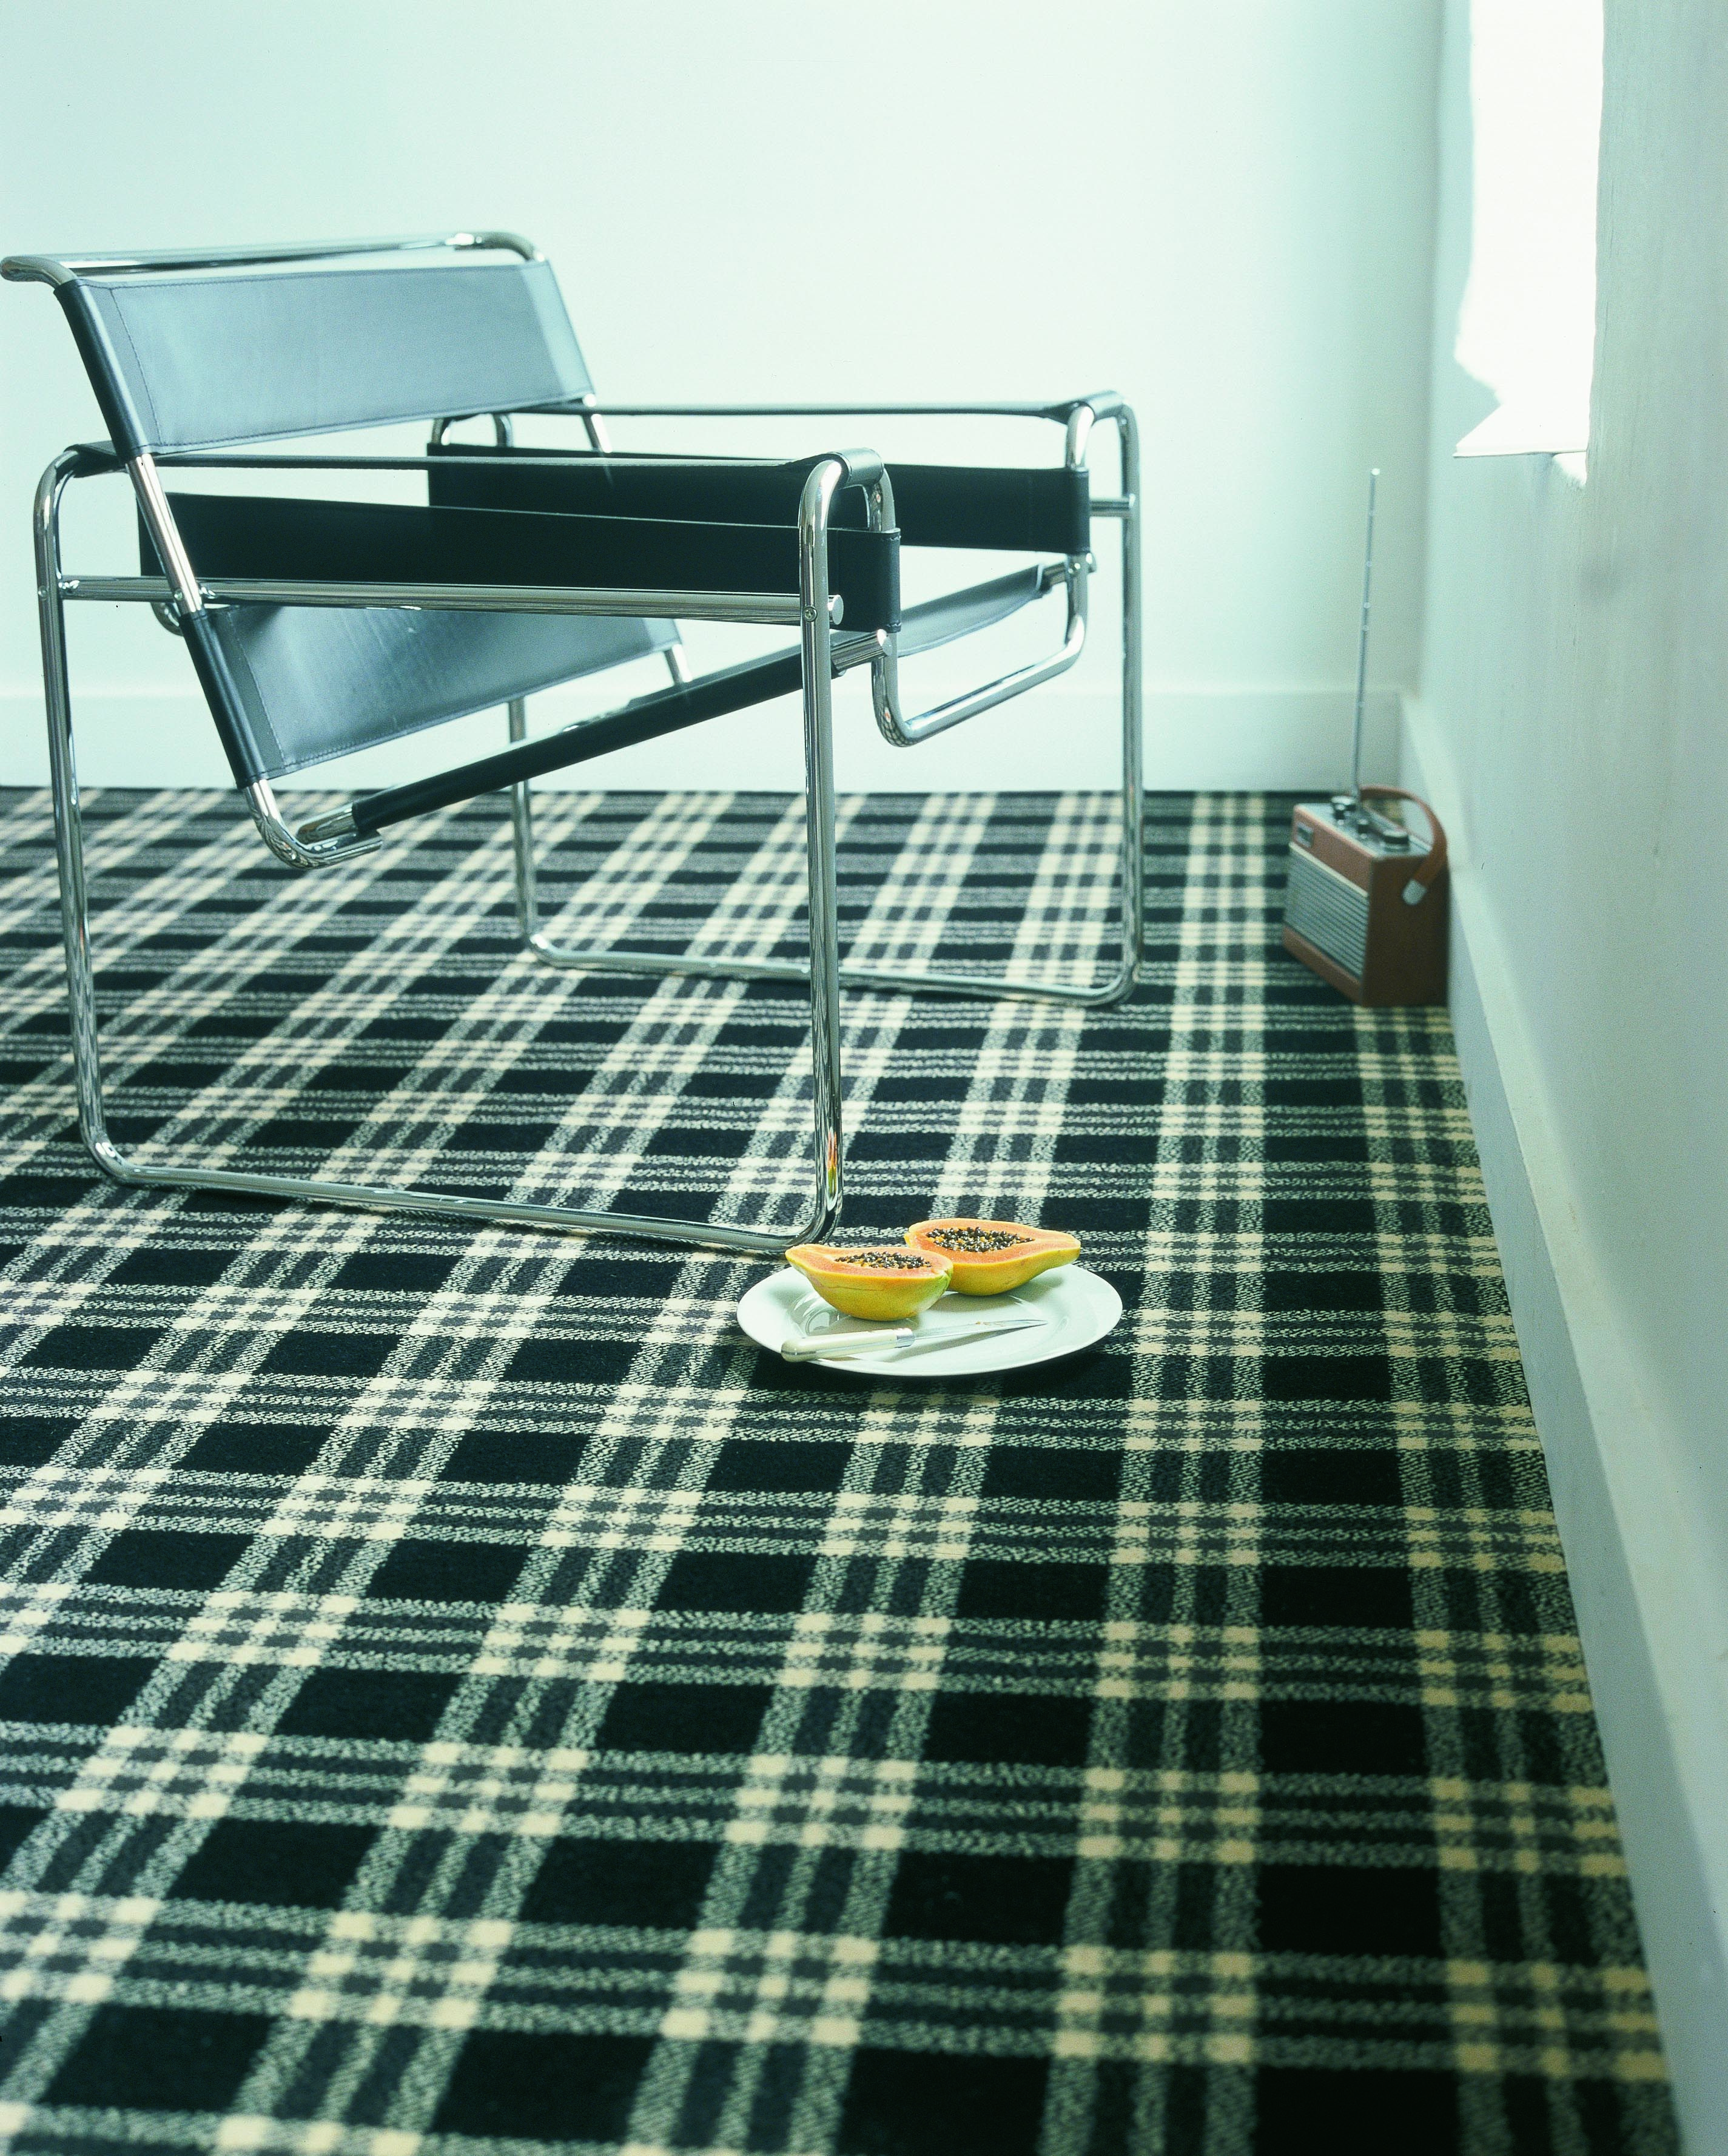 Brintons Abbotsford Border Plaid, 917089, Black, White, Tartan Carpet